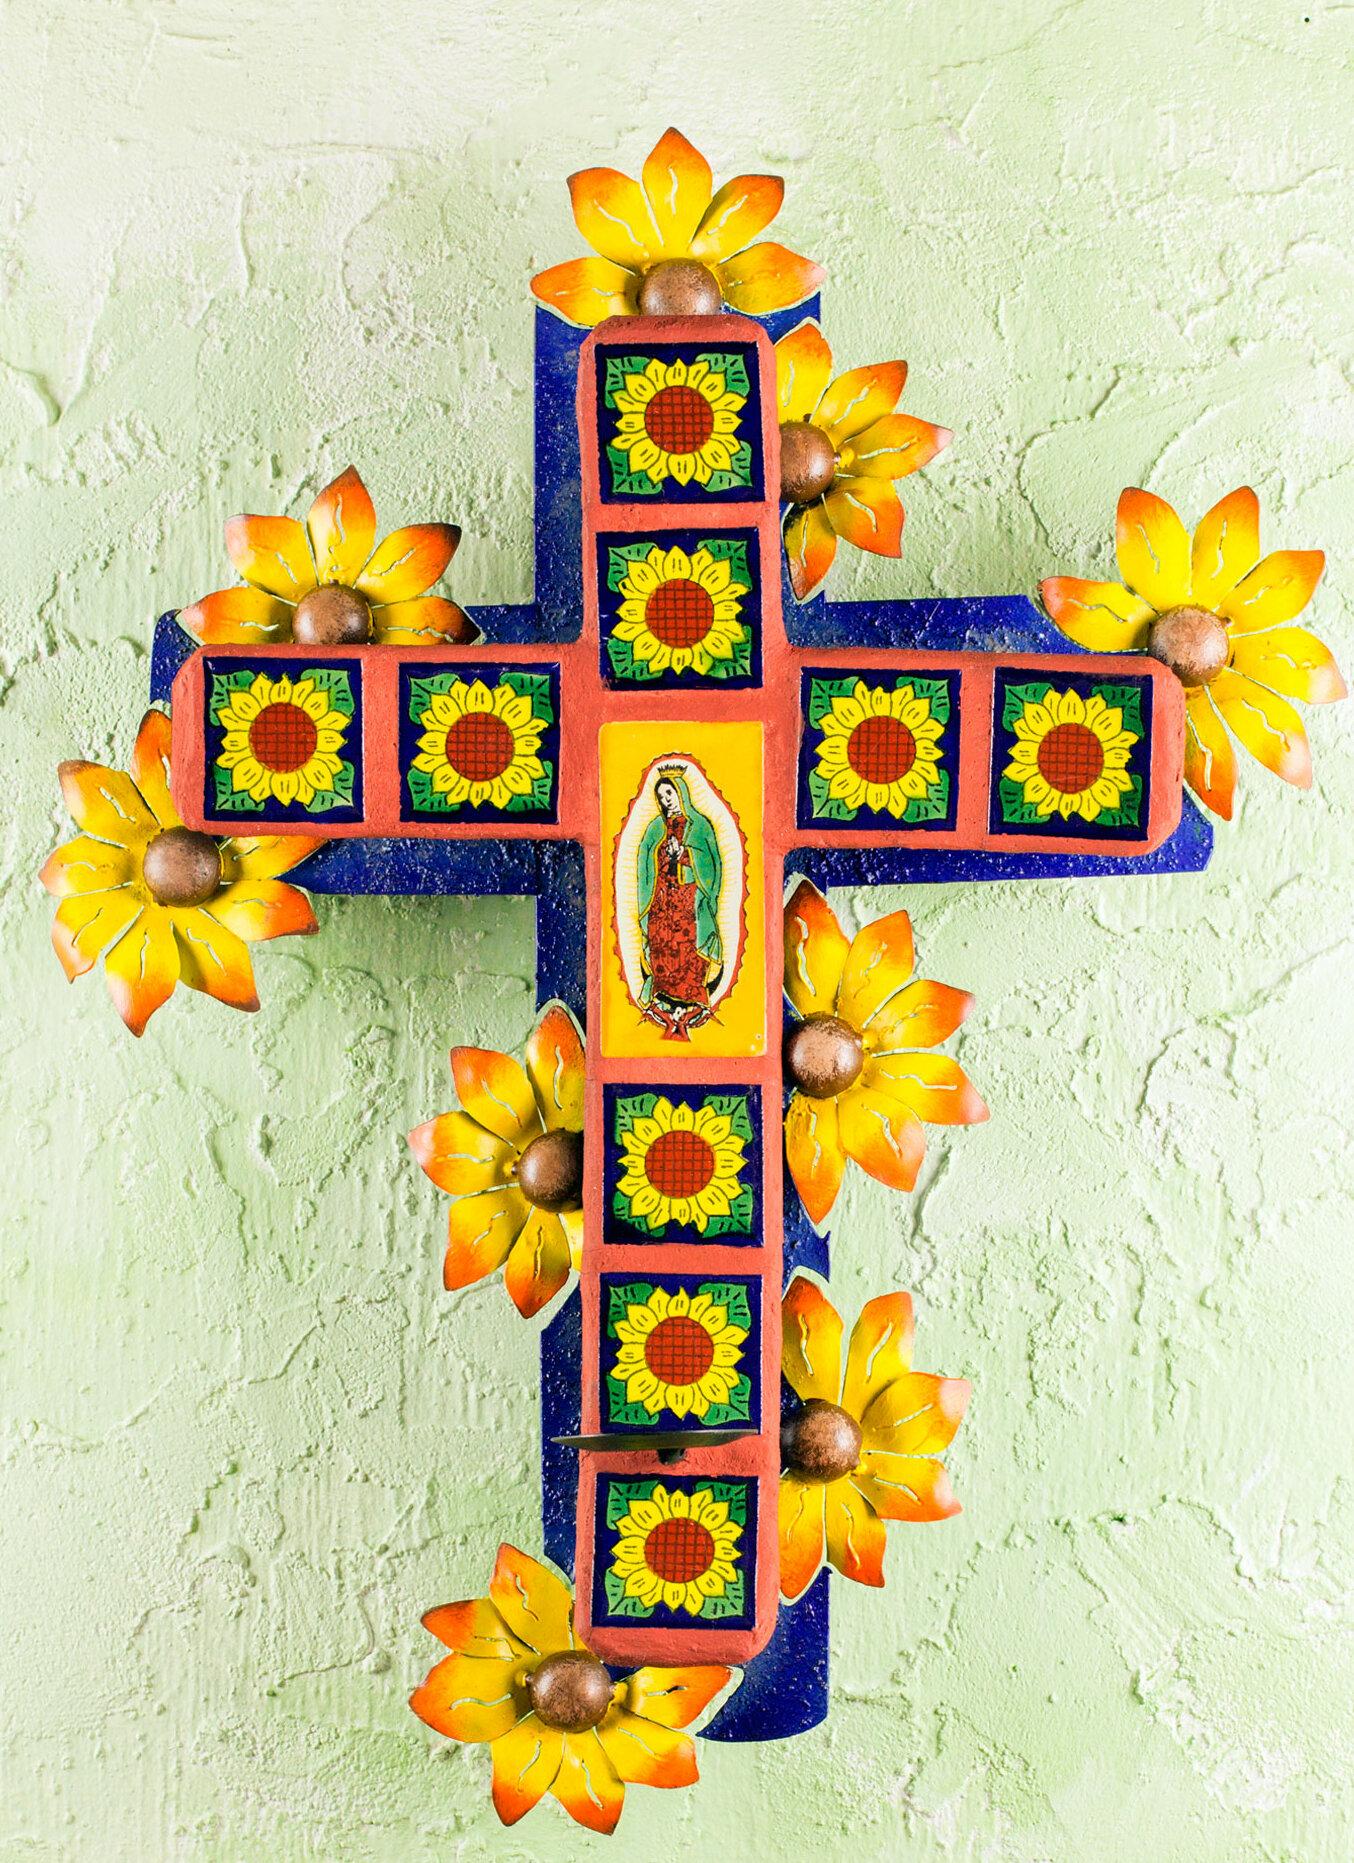 Novica Fair Trade Religious Ceramic Wall Décor | Wayfair